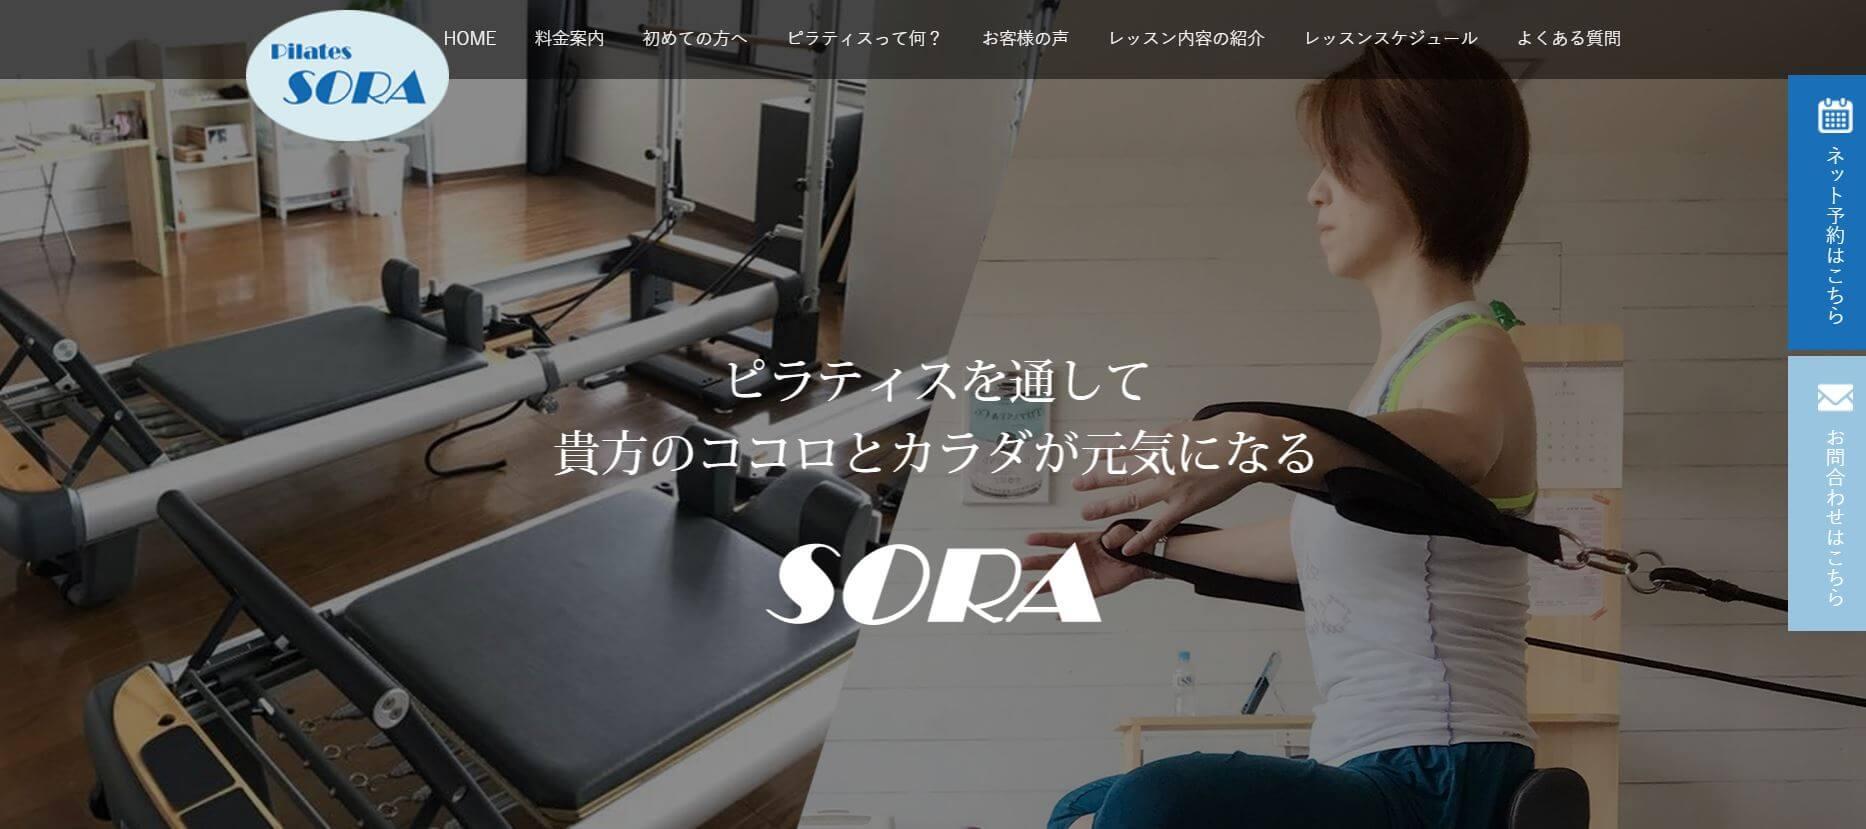 Pilates SORA(ソーラ)